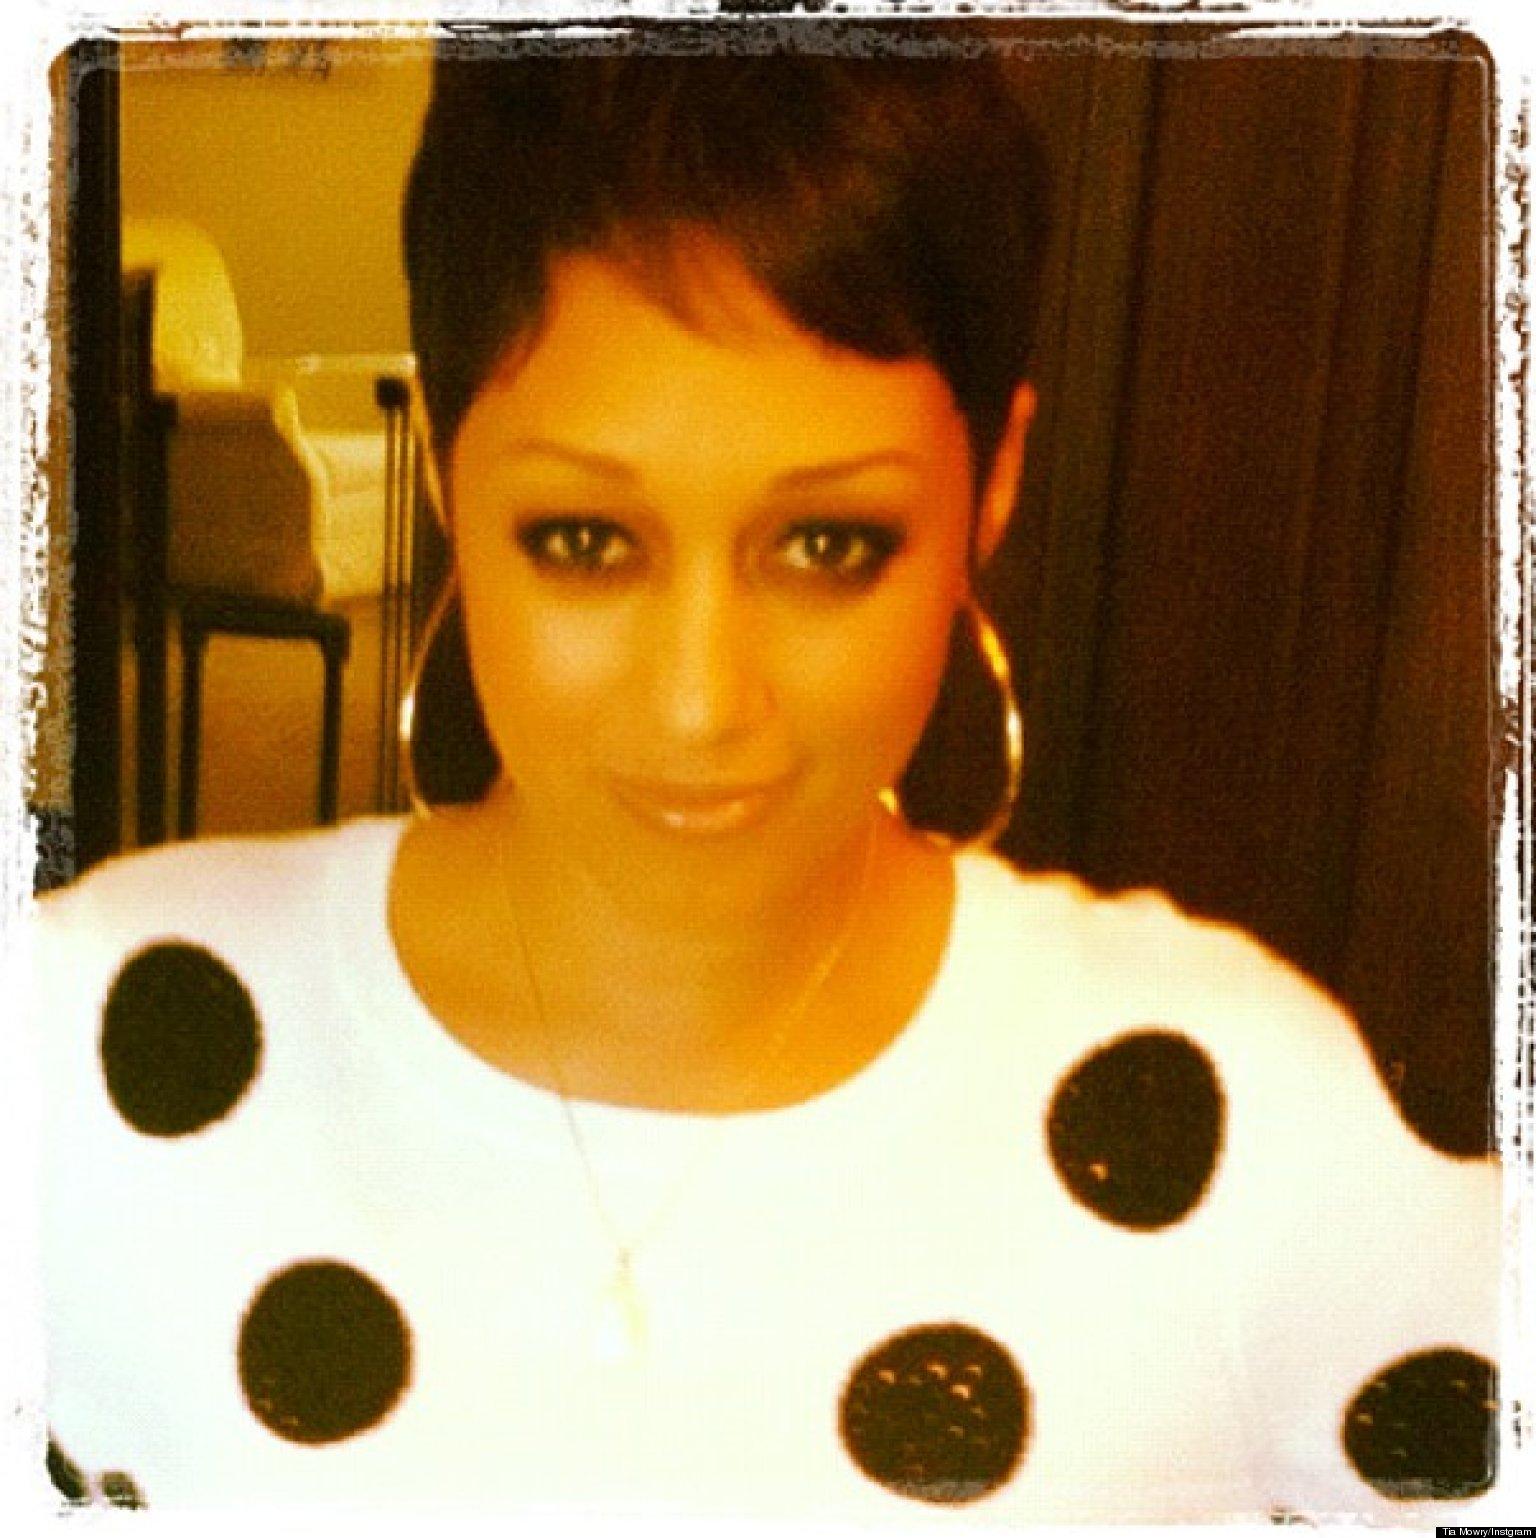 Phenomenal Tia Mowry Haircut 39Tia Amp Tamera39 Star Chops It All Off Photo Short Hairstyles Gunalazisus